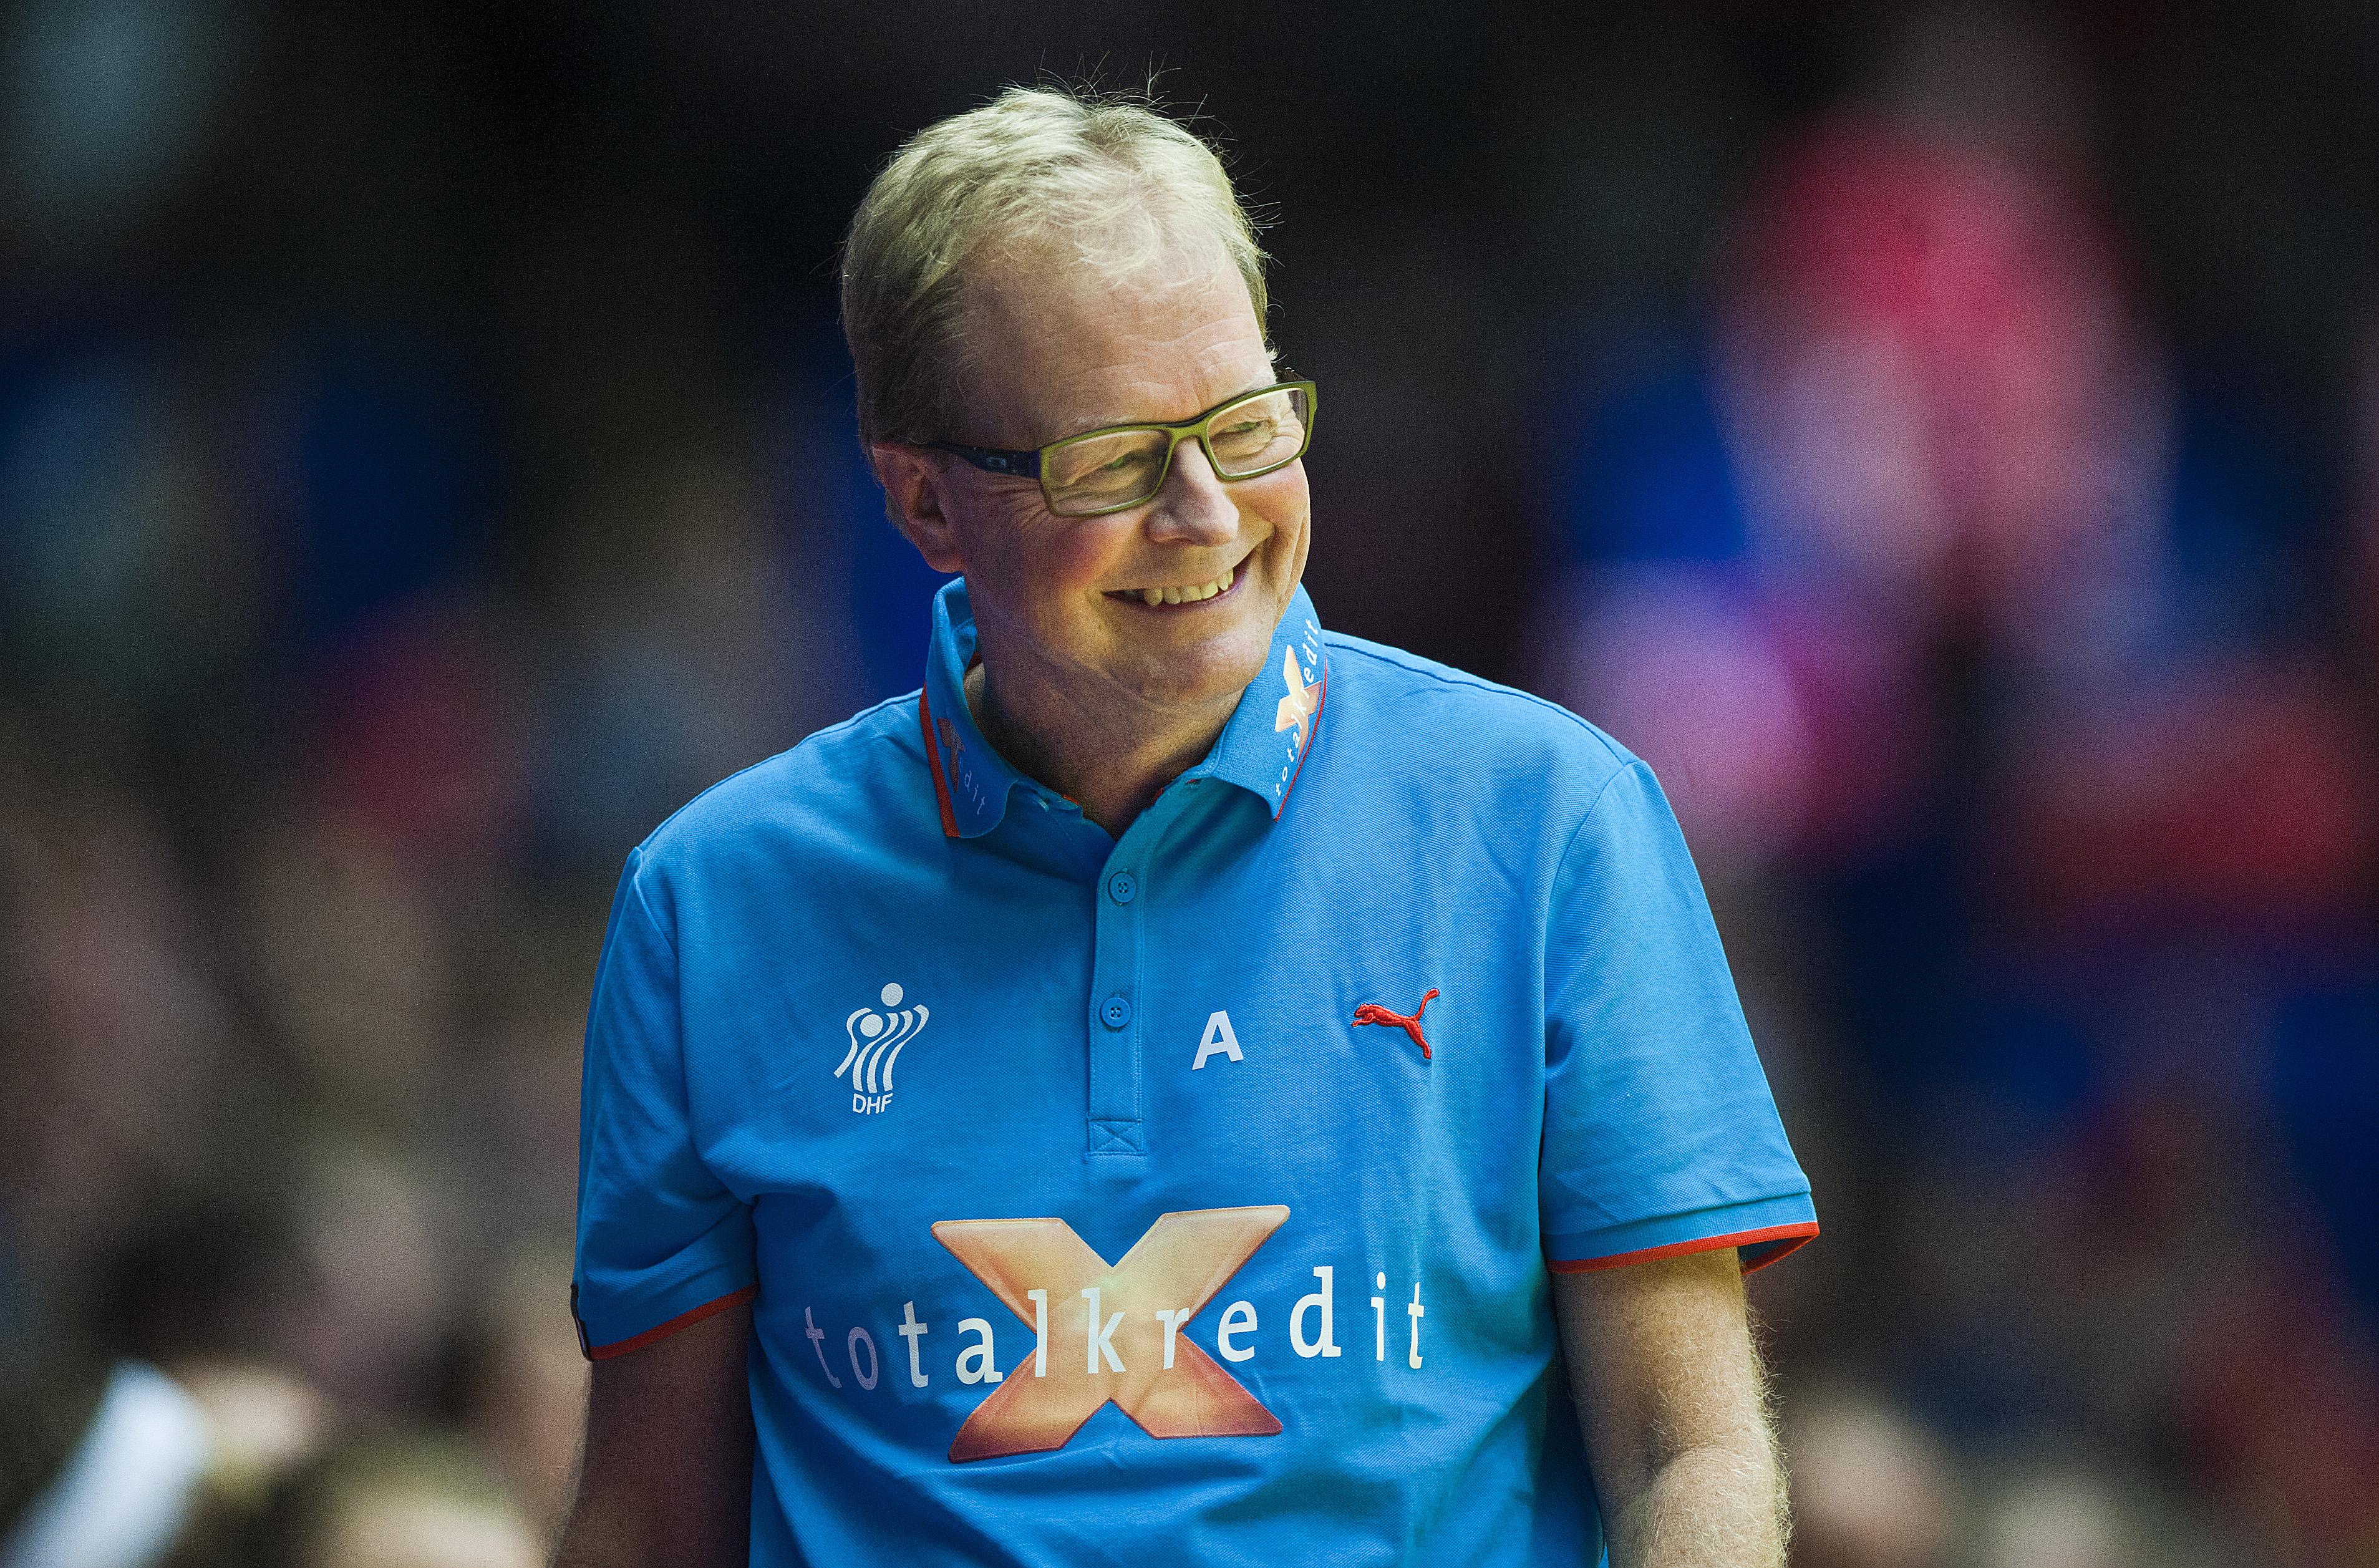 Ulrik Wilbek, sportschef i Dansk Håndbold Forbund